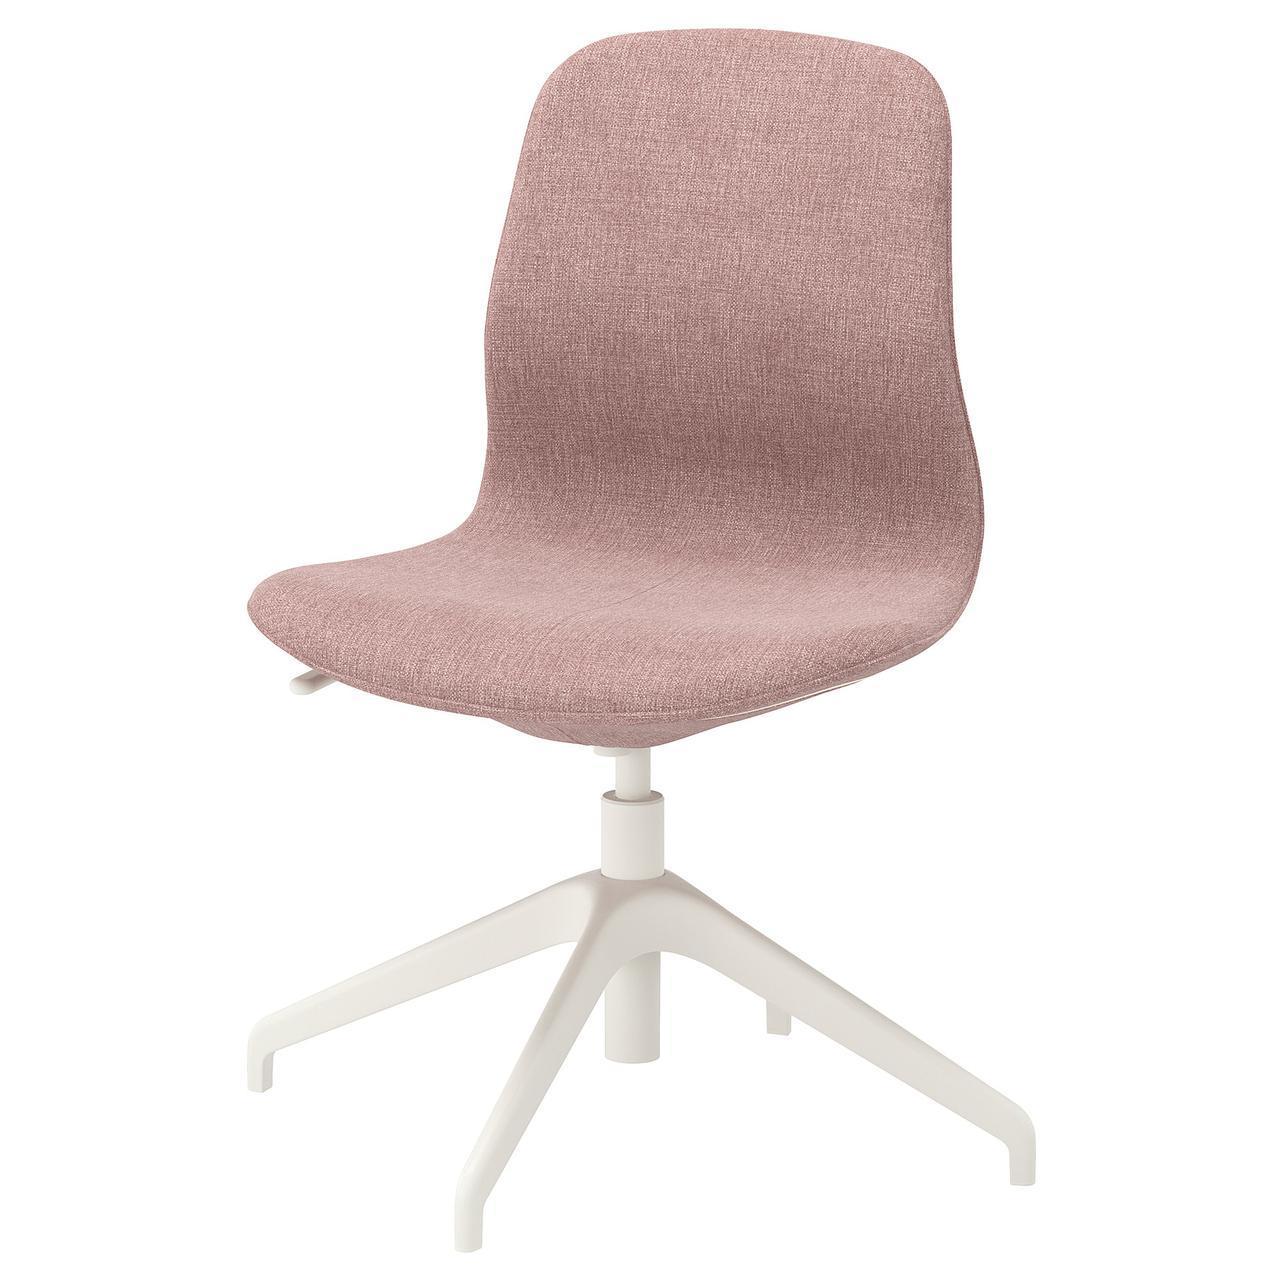 IKEA LANGFJALL (892.523.39) Компьютерное кресло, Gunnared светло-розовый